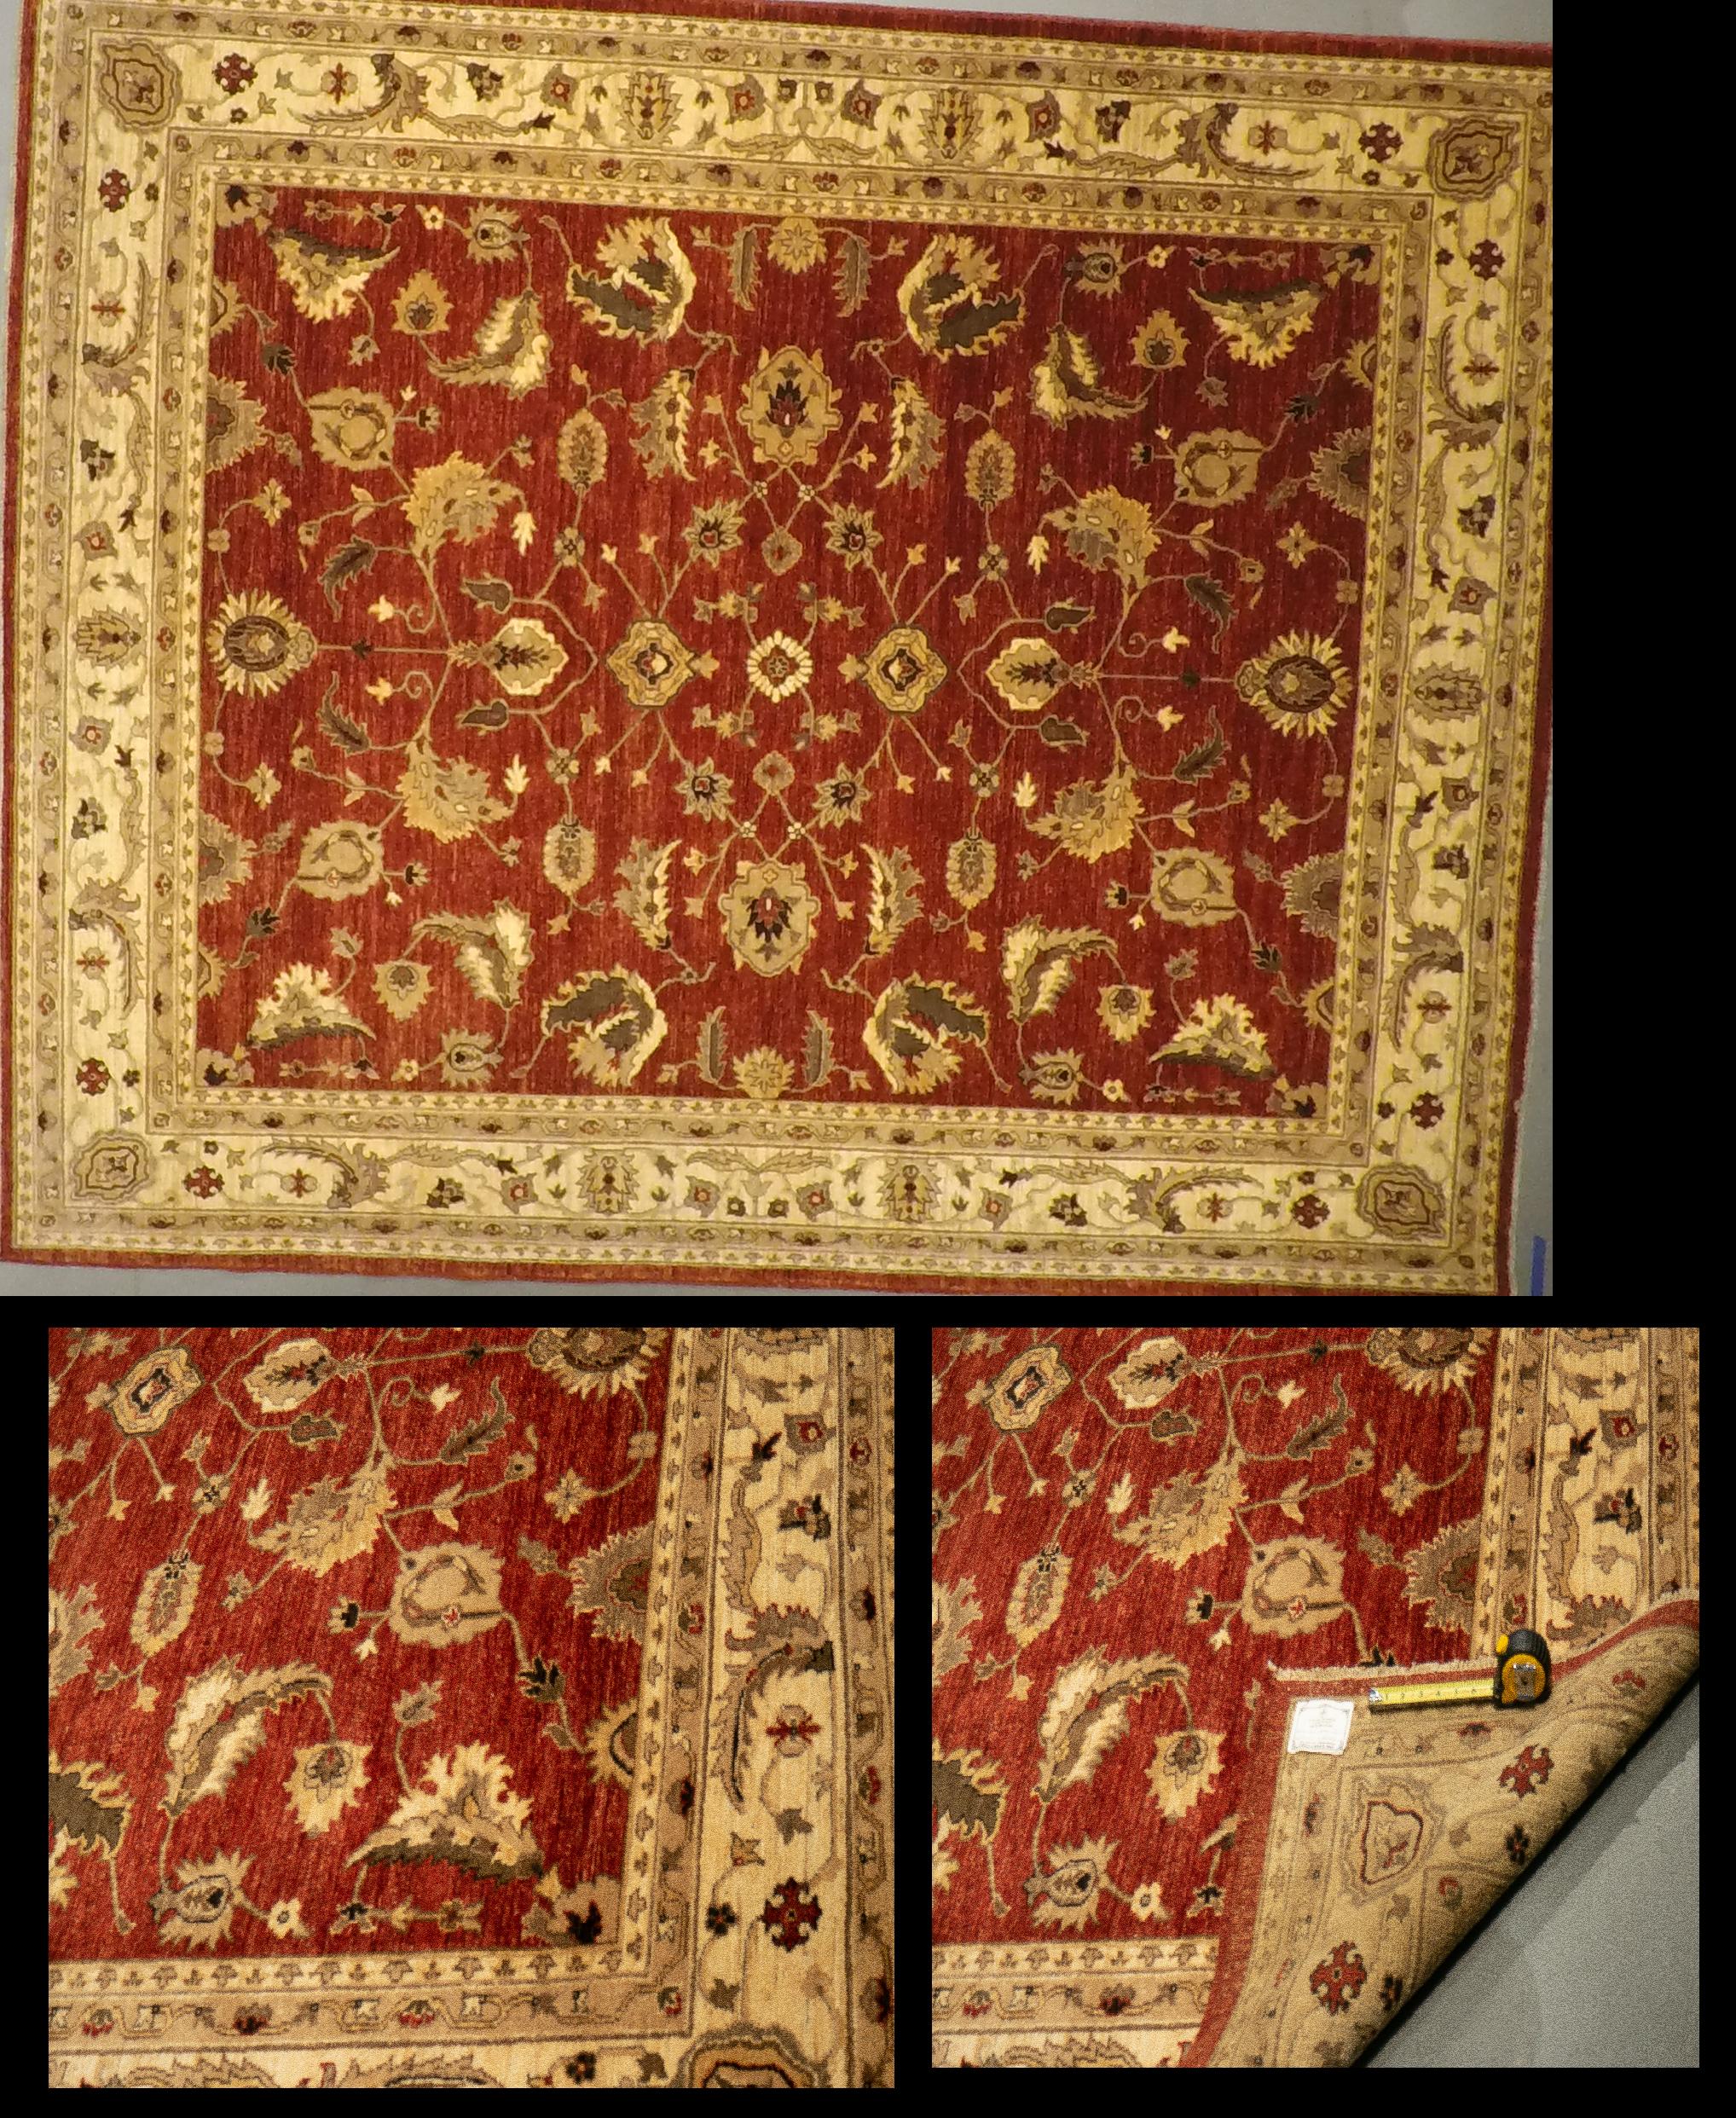 LD48 3712 (8.3 x 9) Wool-Handmade